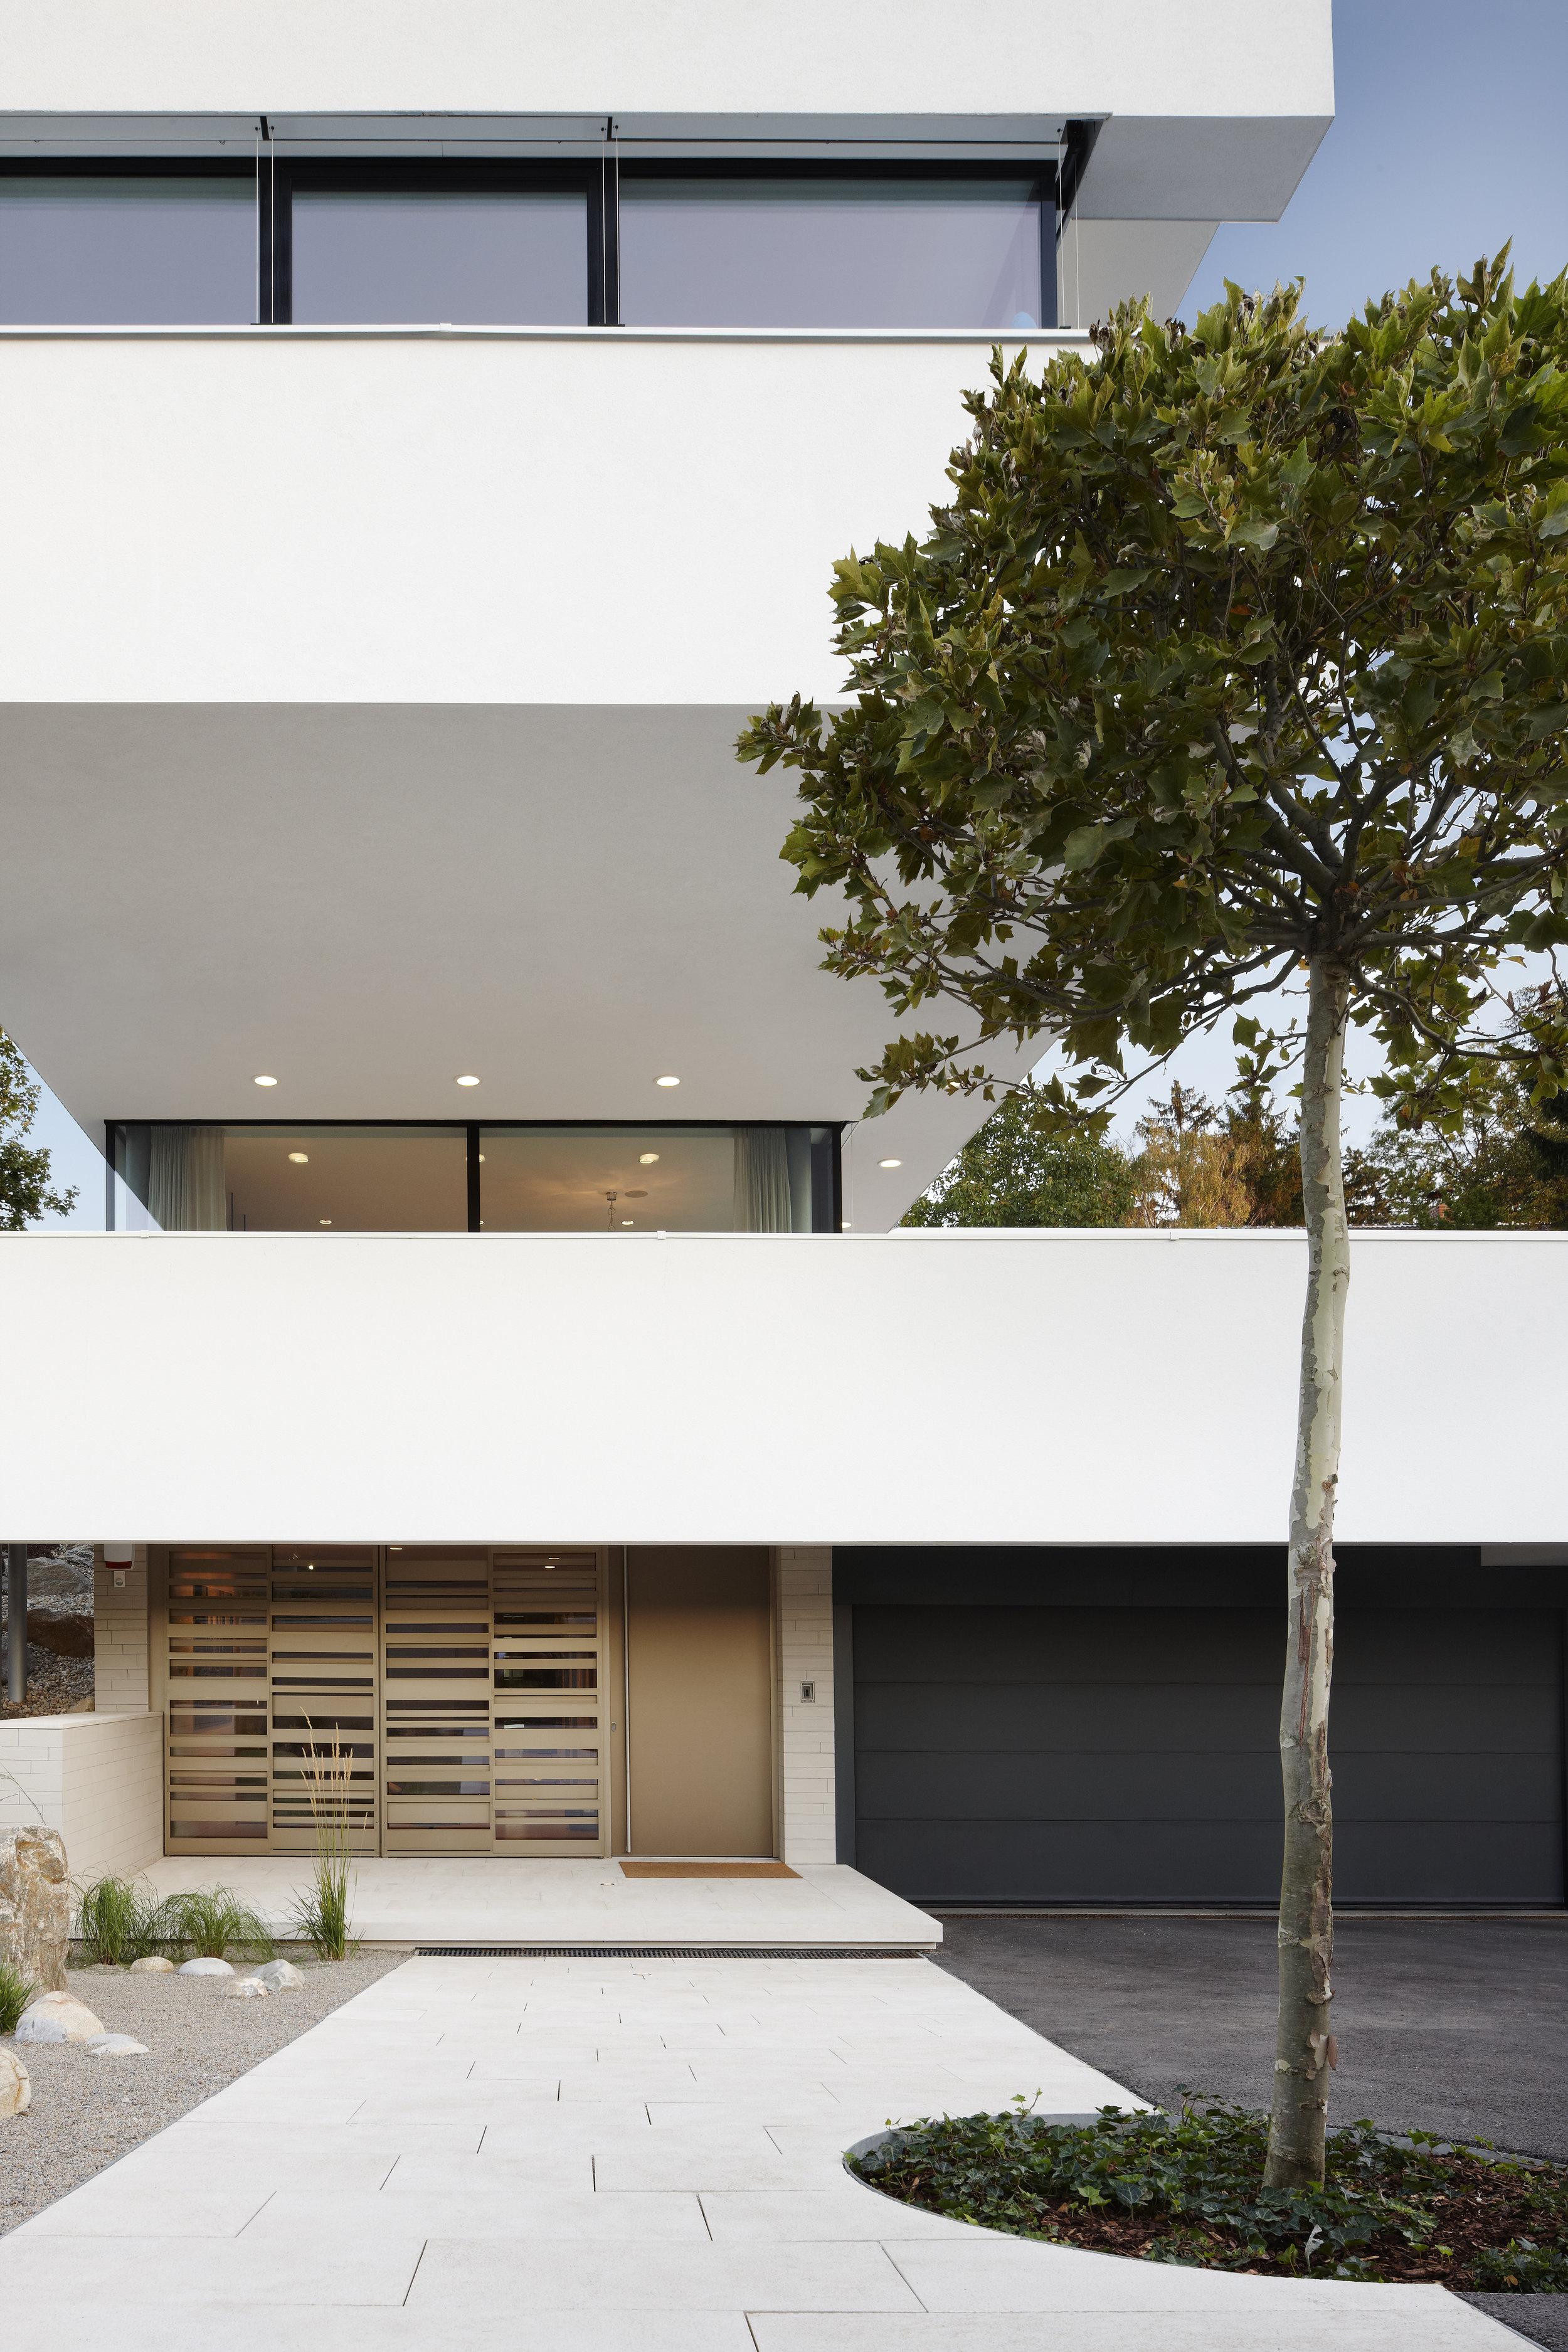 A01 architects - Residence Ödberg_Philipp Kreidl110916_DS__0092_ret__web05.jpg